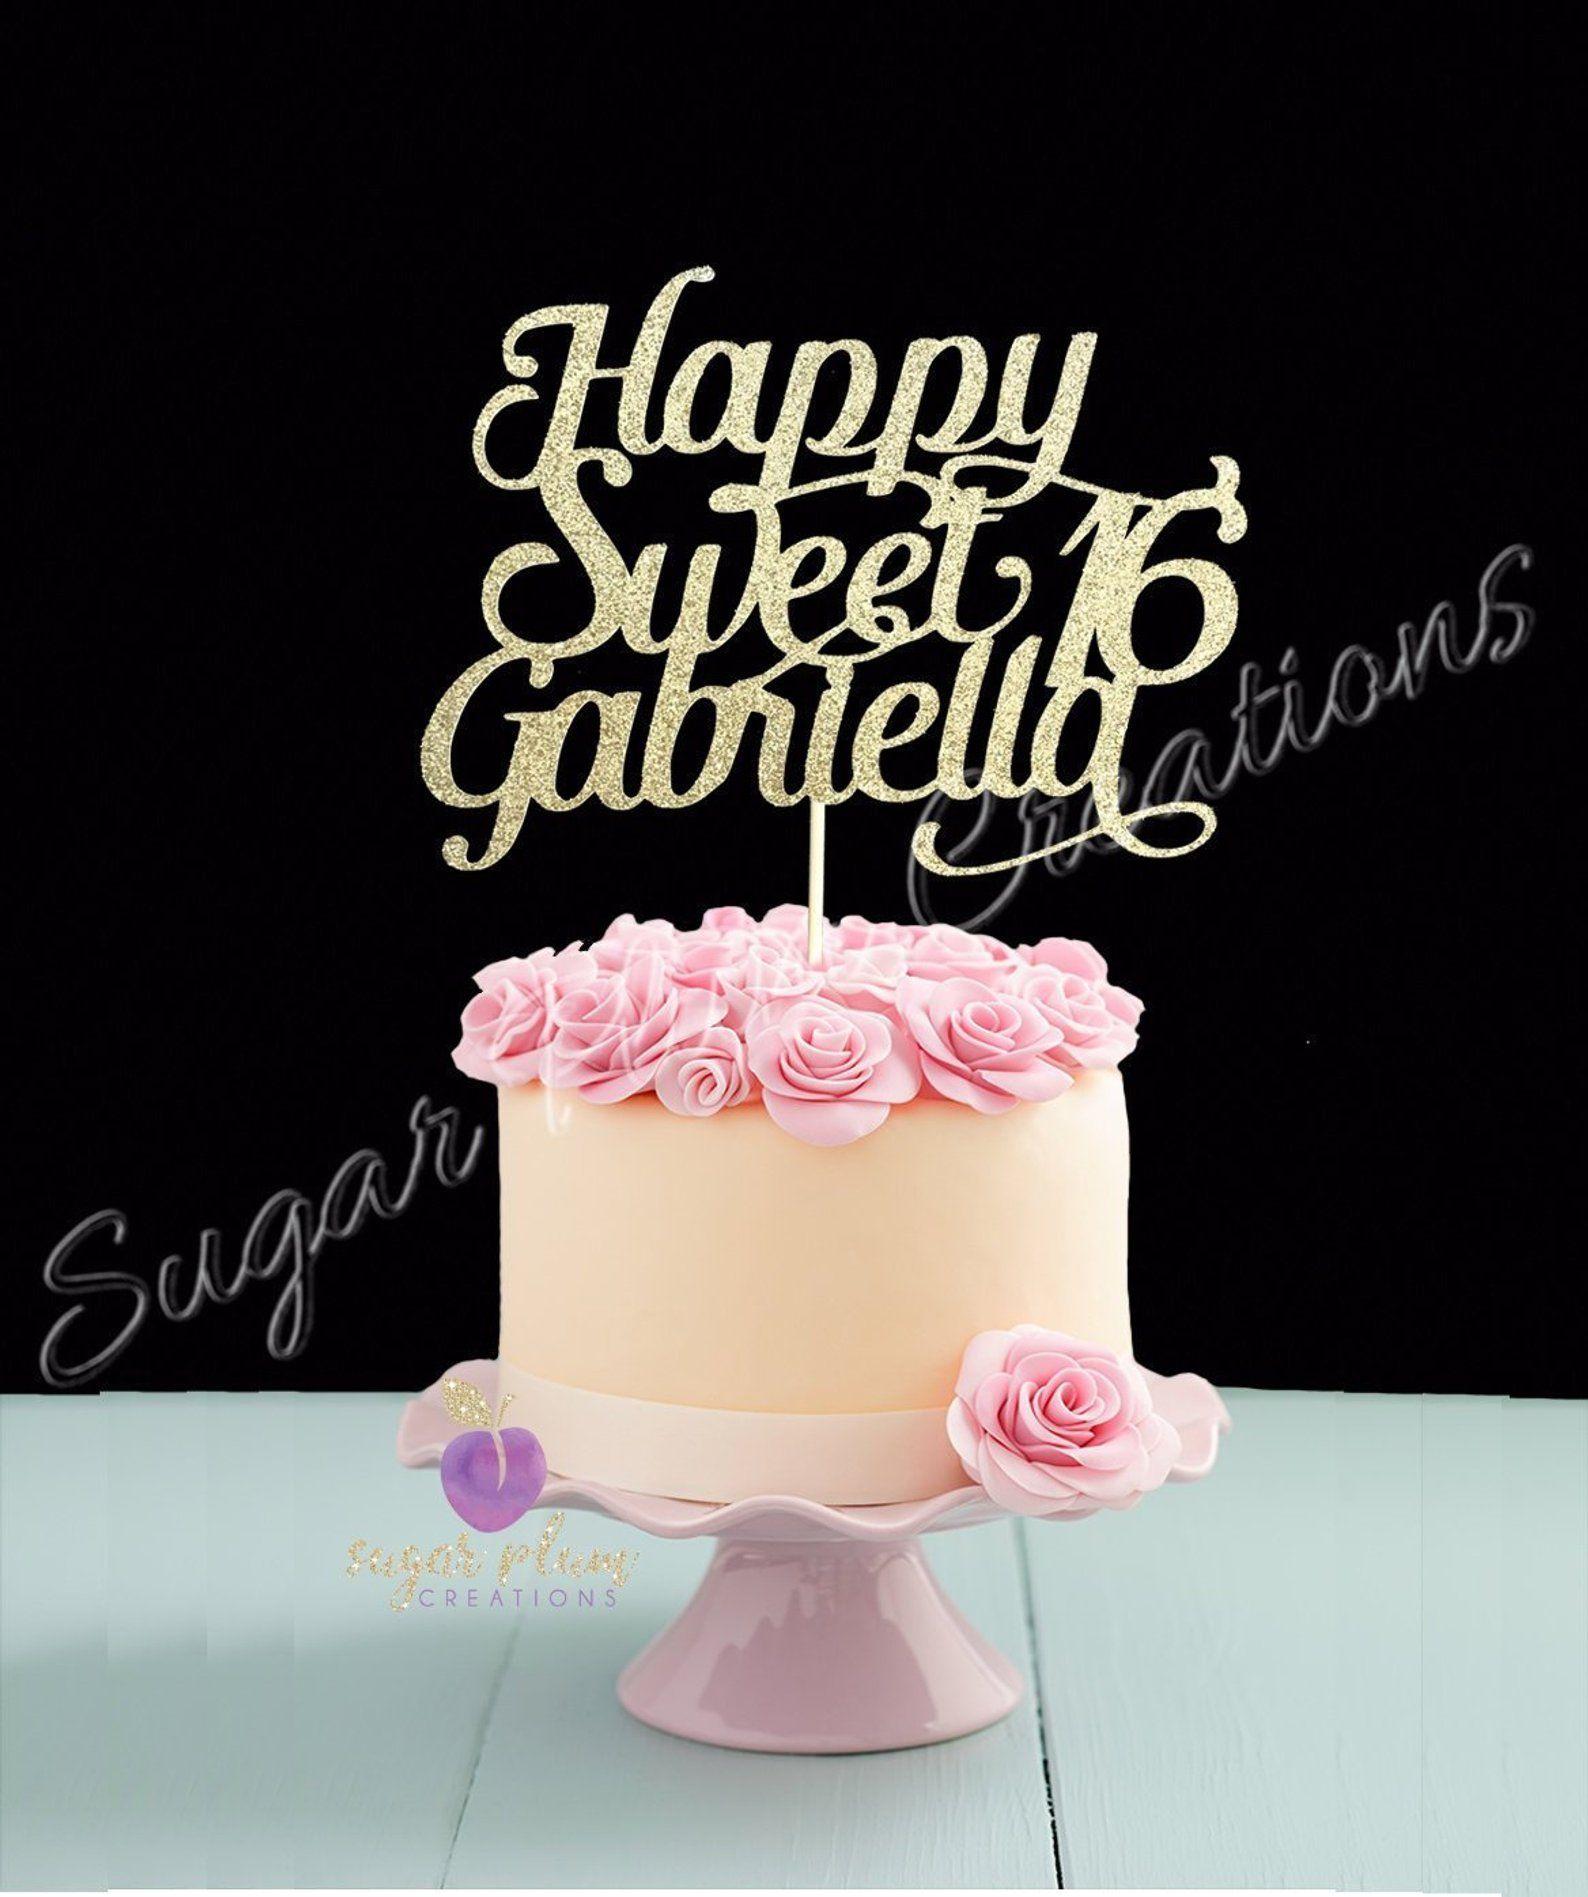 Any Name, Glitter Happy Sweet 16 Birthday Cake Topper